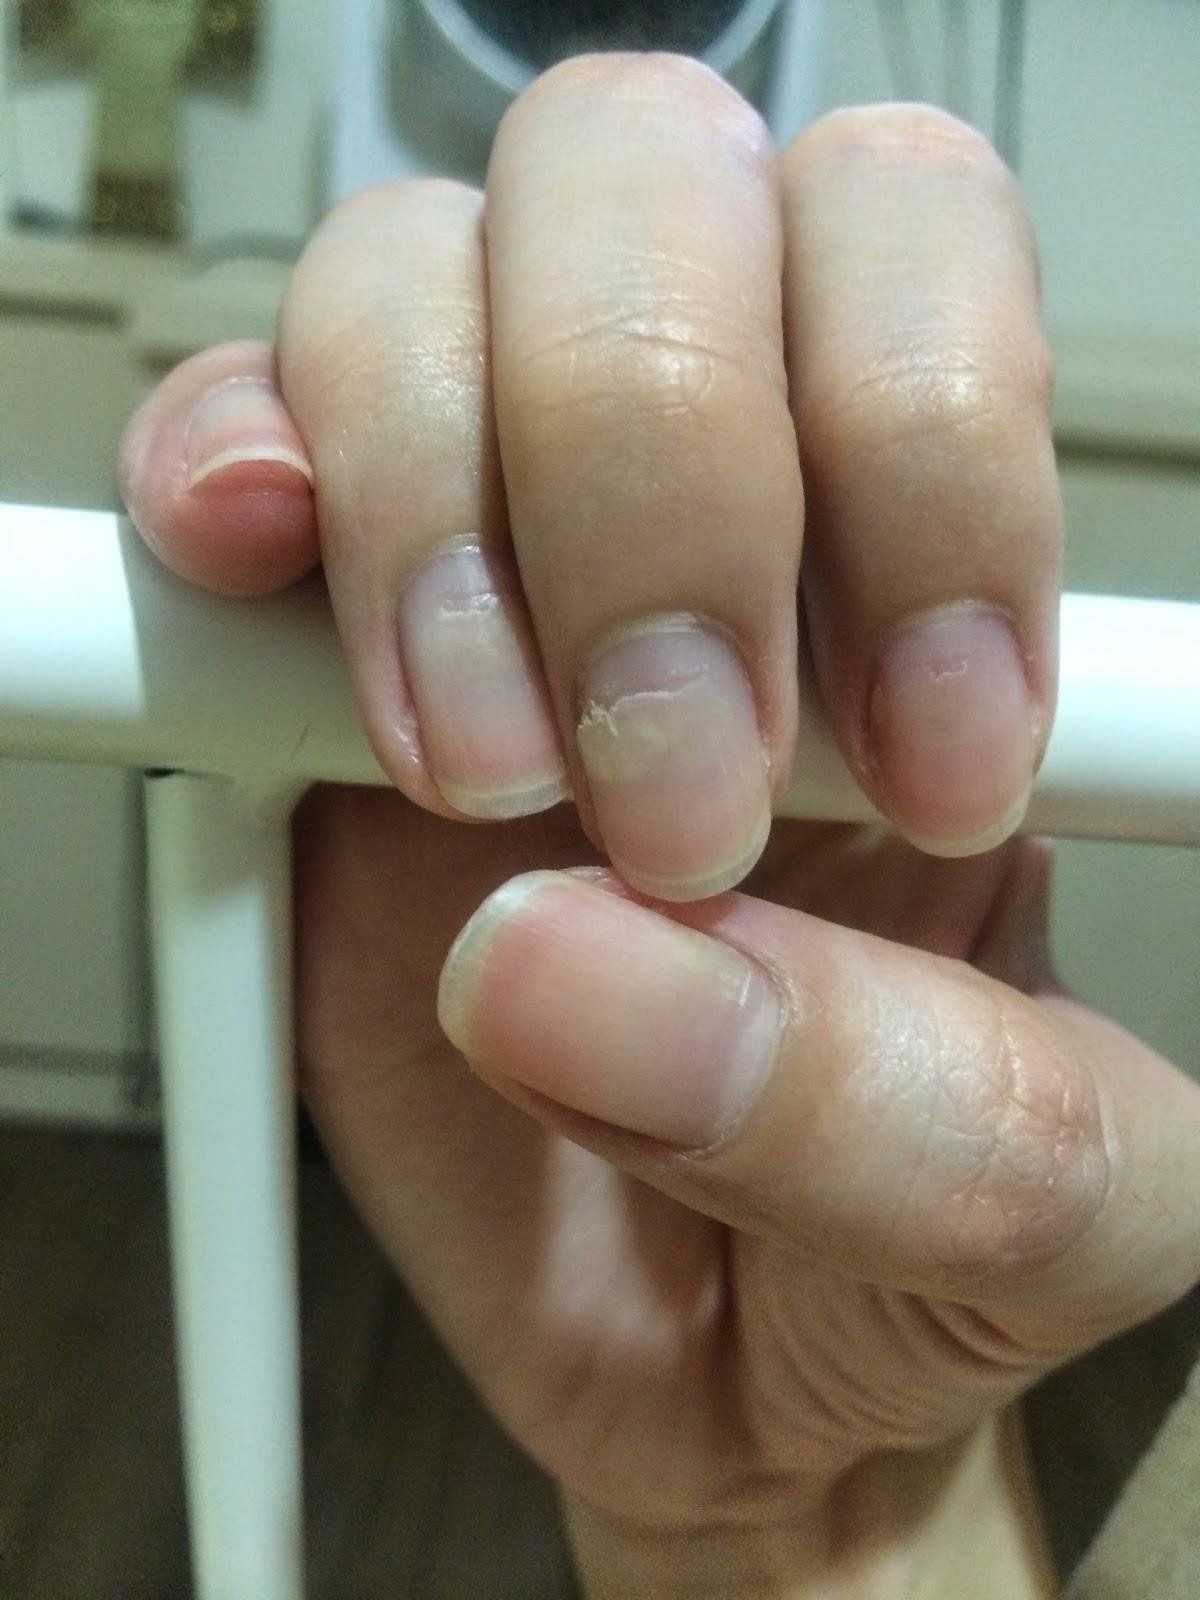 The Dettol Diaries: Peeling Fingernails After HFMD